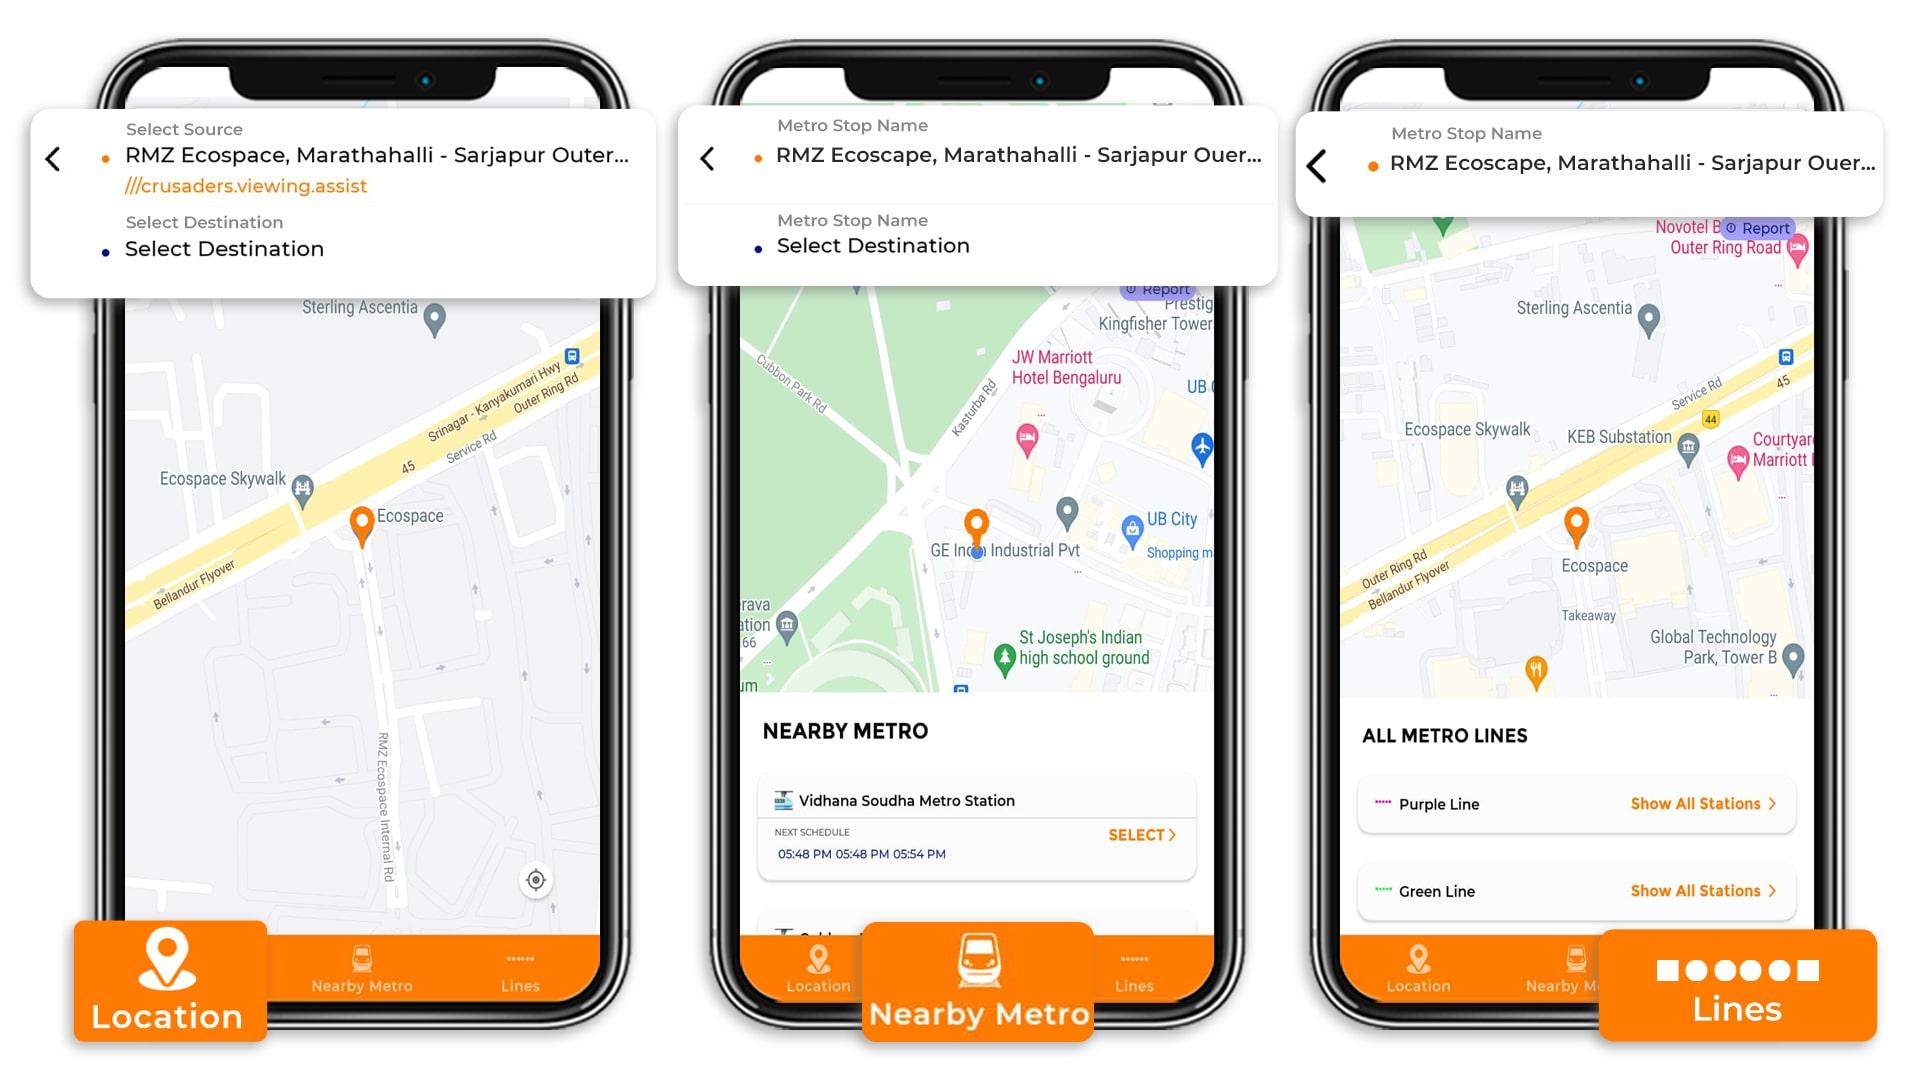 Tummoc app, Tummoc, Namma metro, Green line, Public transportation